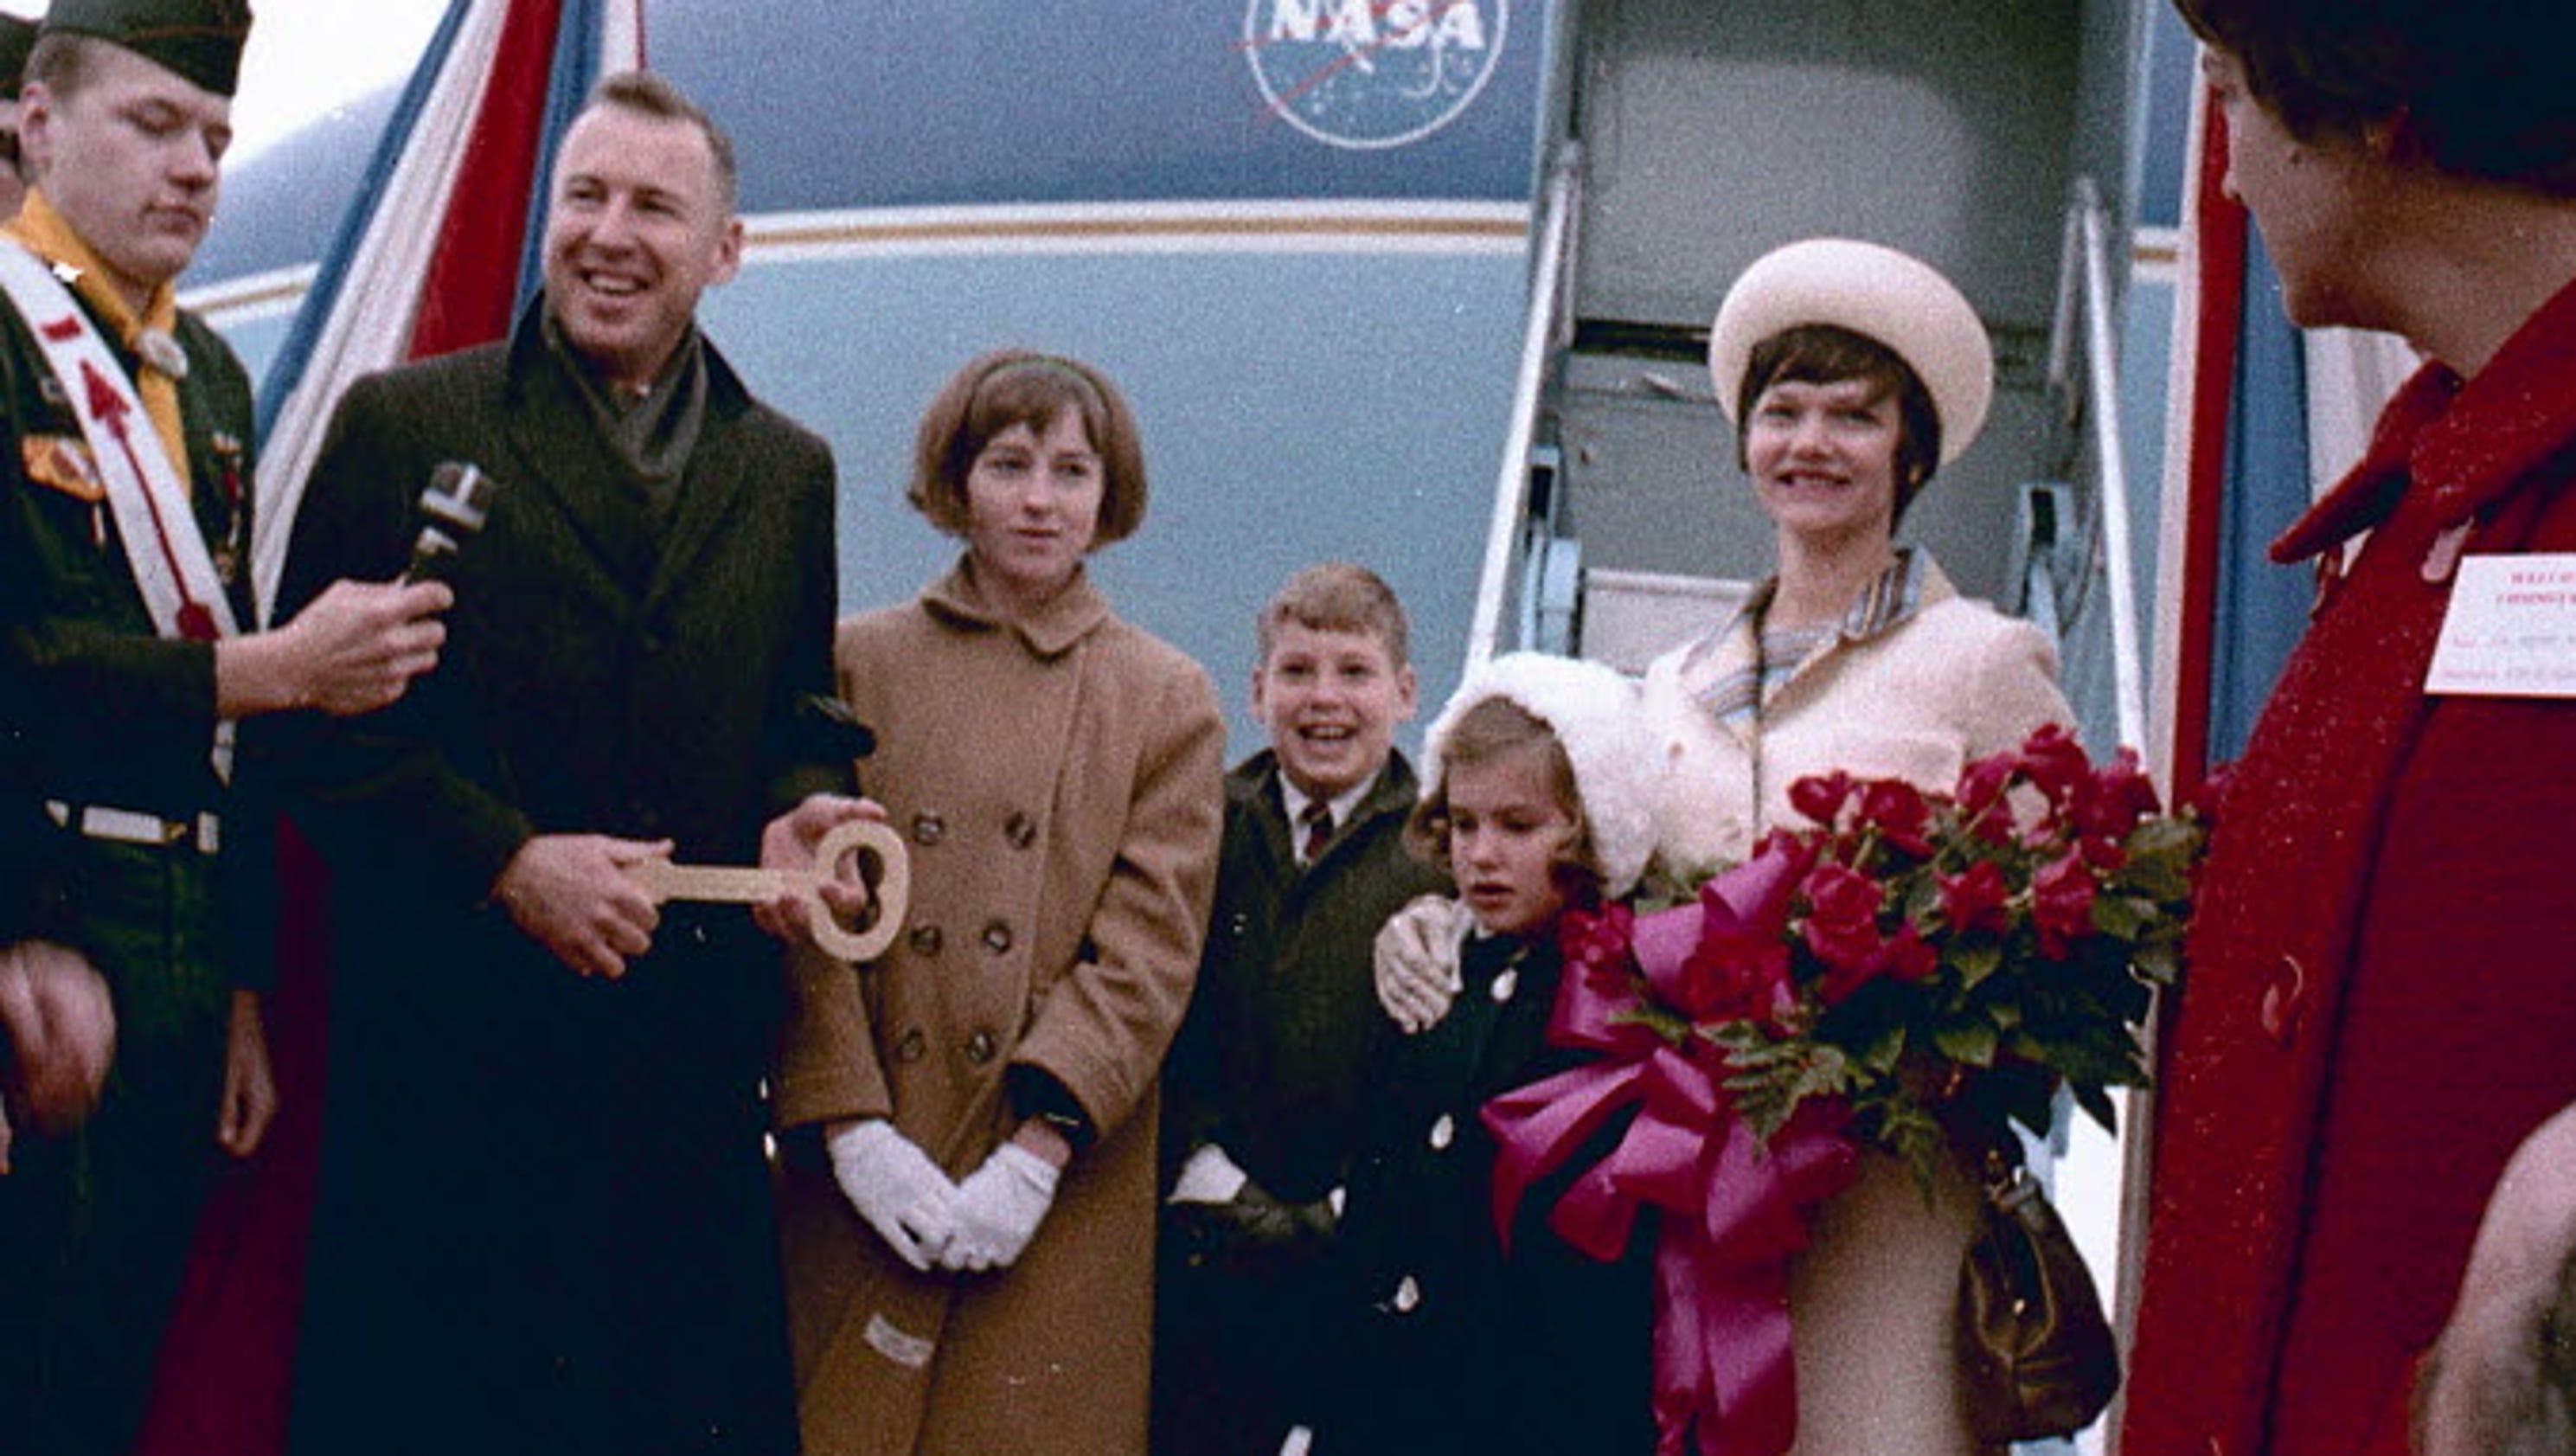 Lunar Mountain Named After Apollo 13 Astronaut Jim Lovell